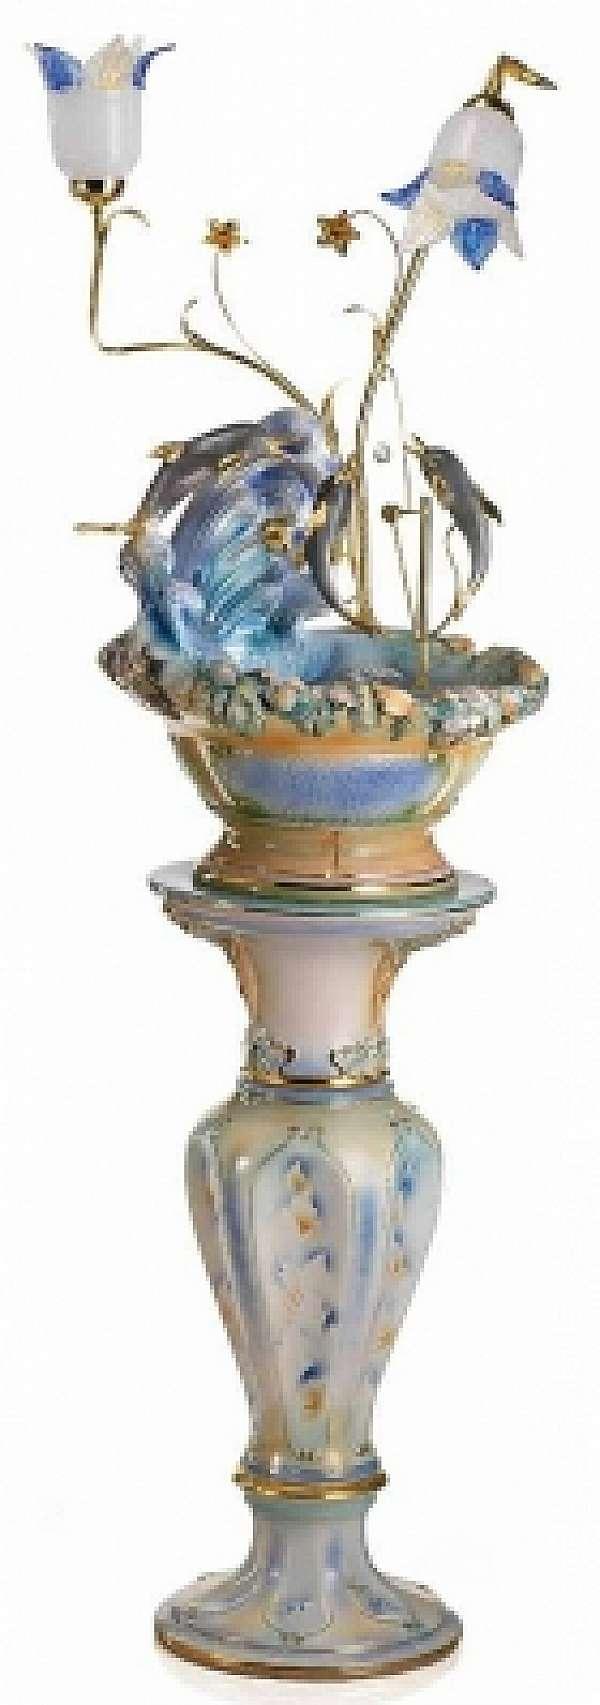 Напольная лампа LORENZON (F.LLI LORENZON) L.698/COLF ARTE E CERAMICA